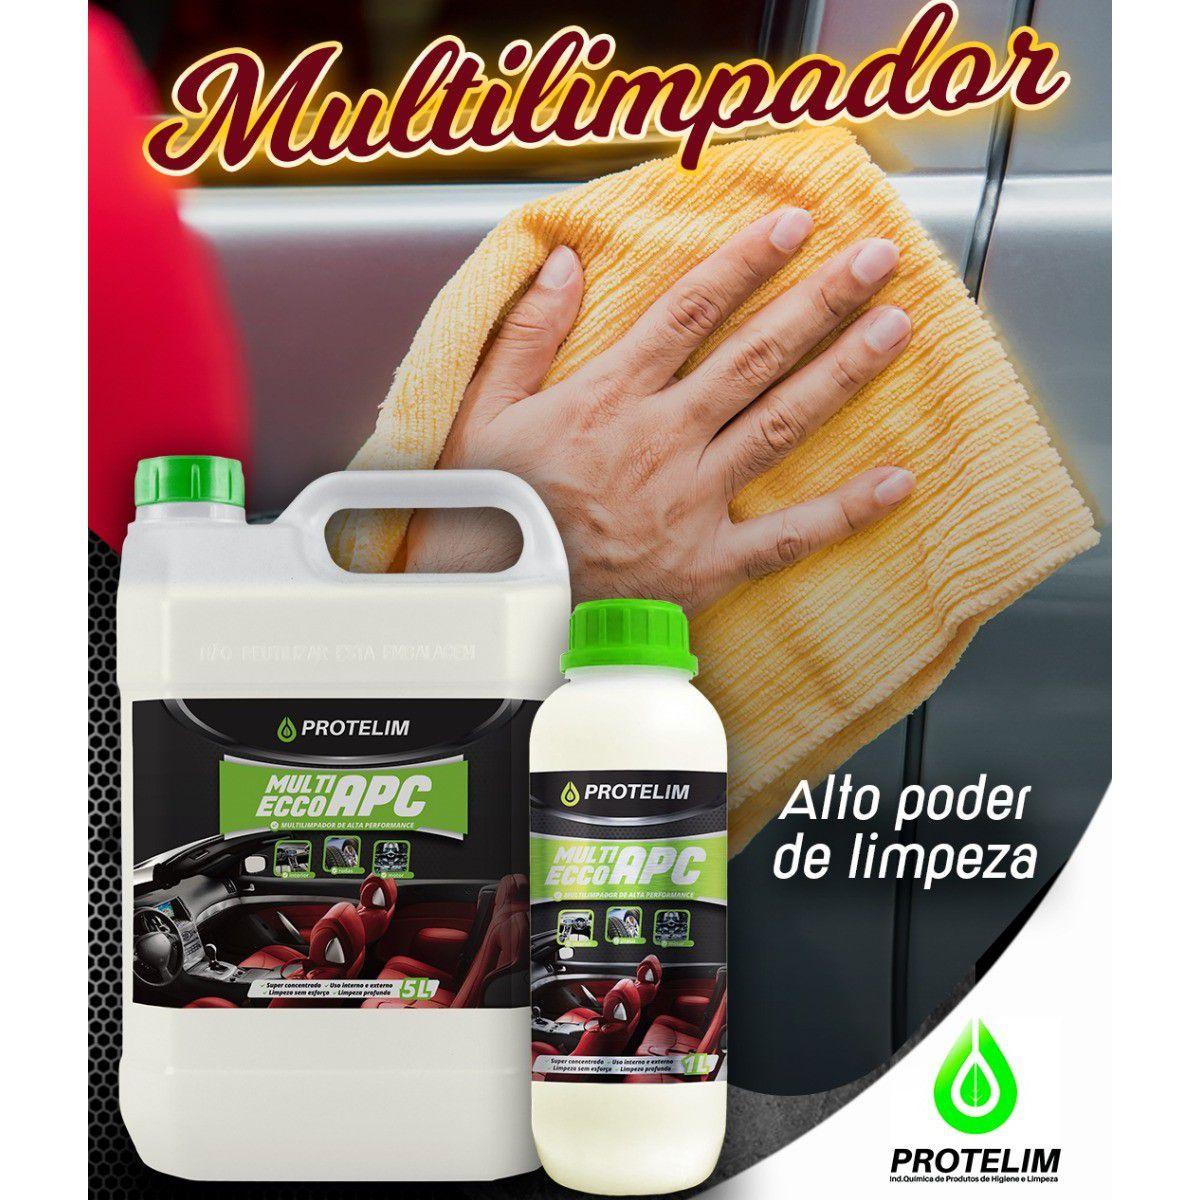 Kit Multilimpador de Alta Performance Protelim APC Multi Ecco Detalhamento Automotivo 1 Litro + 2 Escovas p/ Carpete